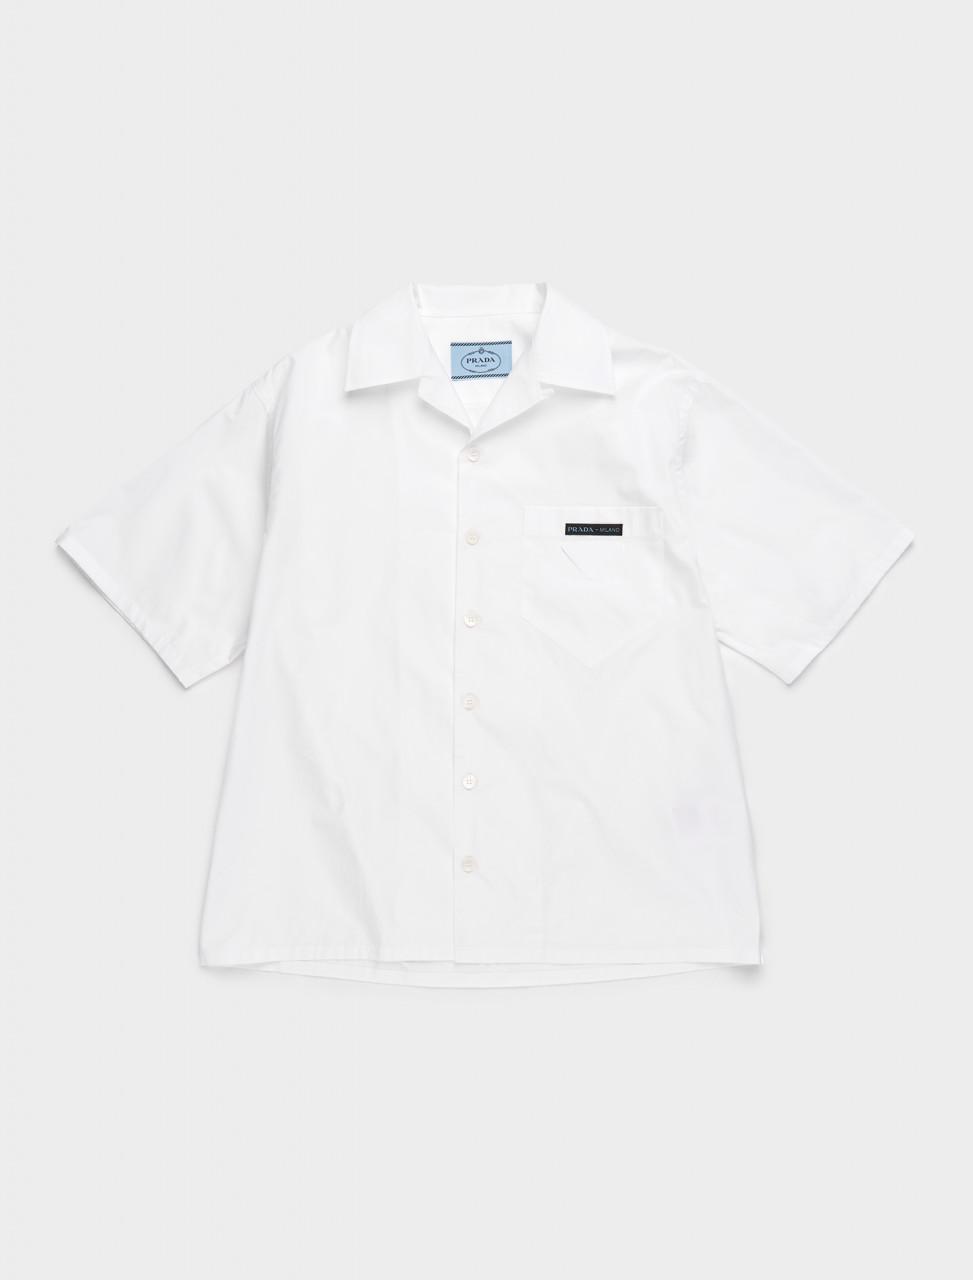 UCS339-F0009 PRADA CAMICIA SHIRT WHITEUCS339-F0009 PRADA CAMICIA SHIRT WHITE